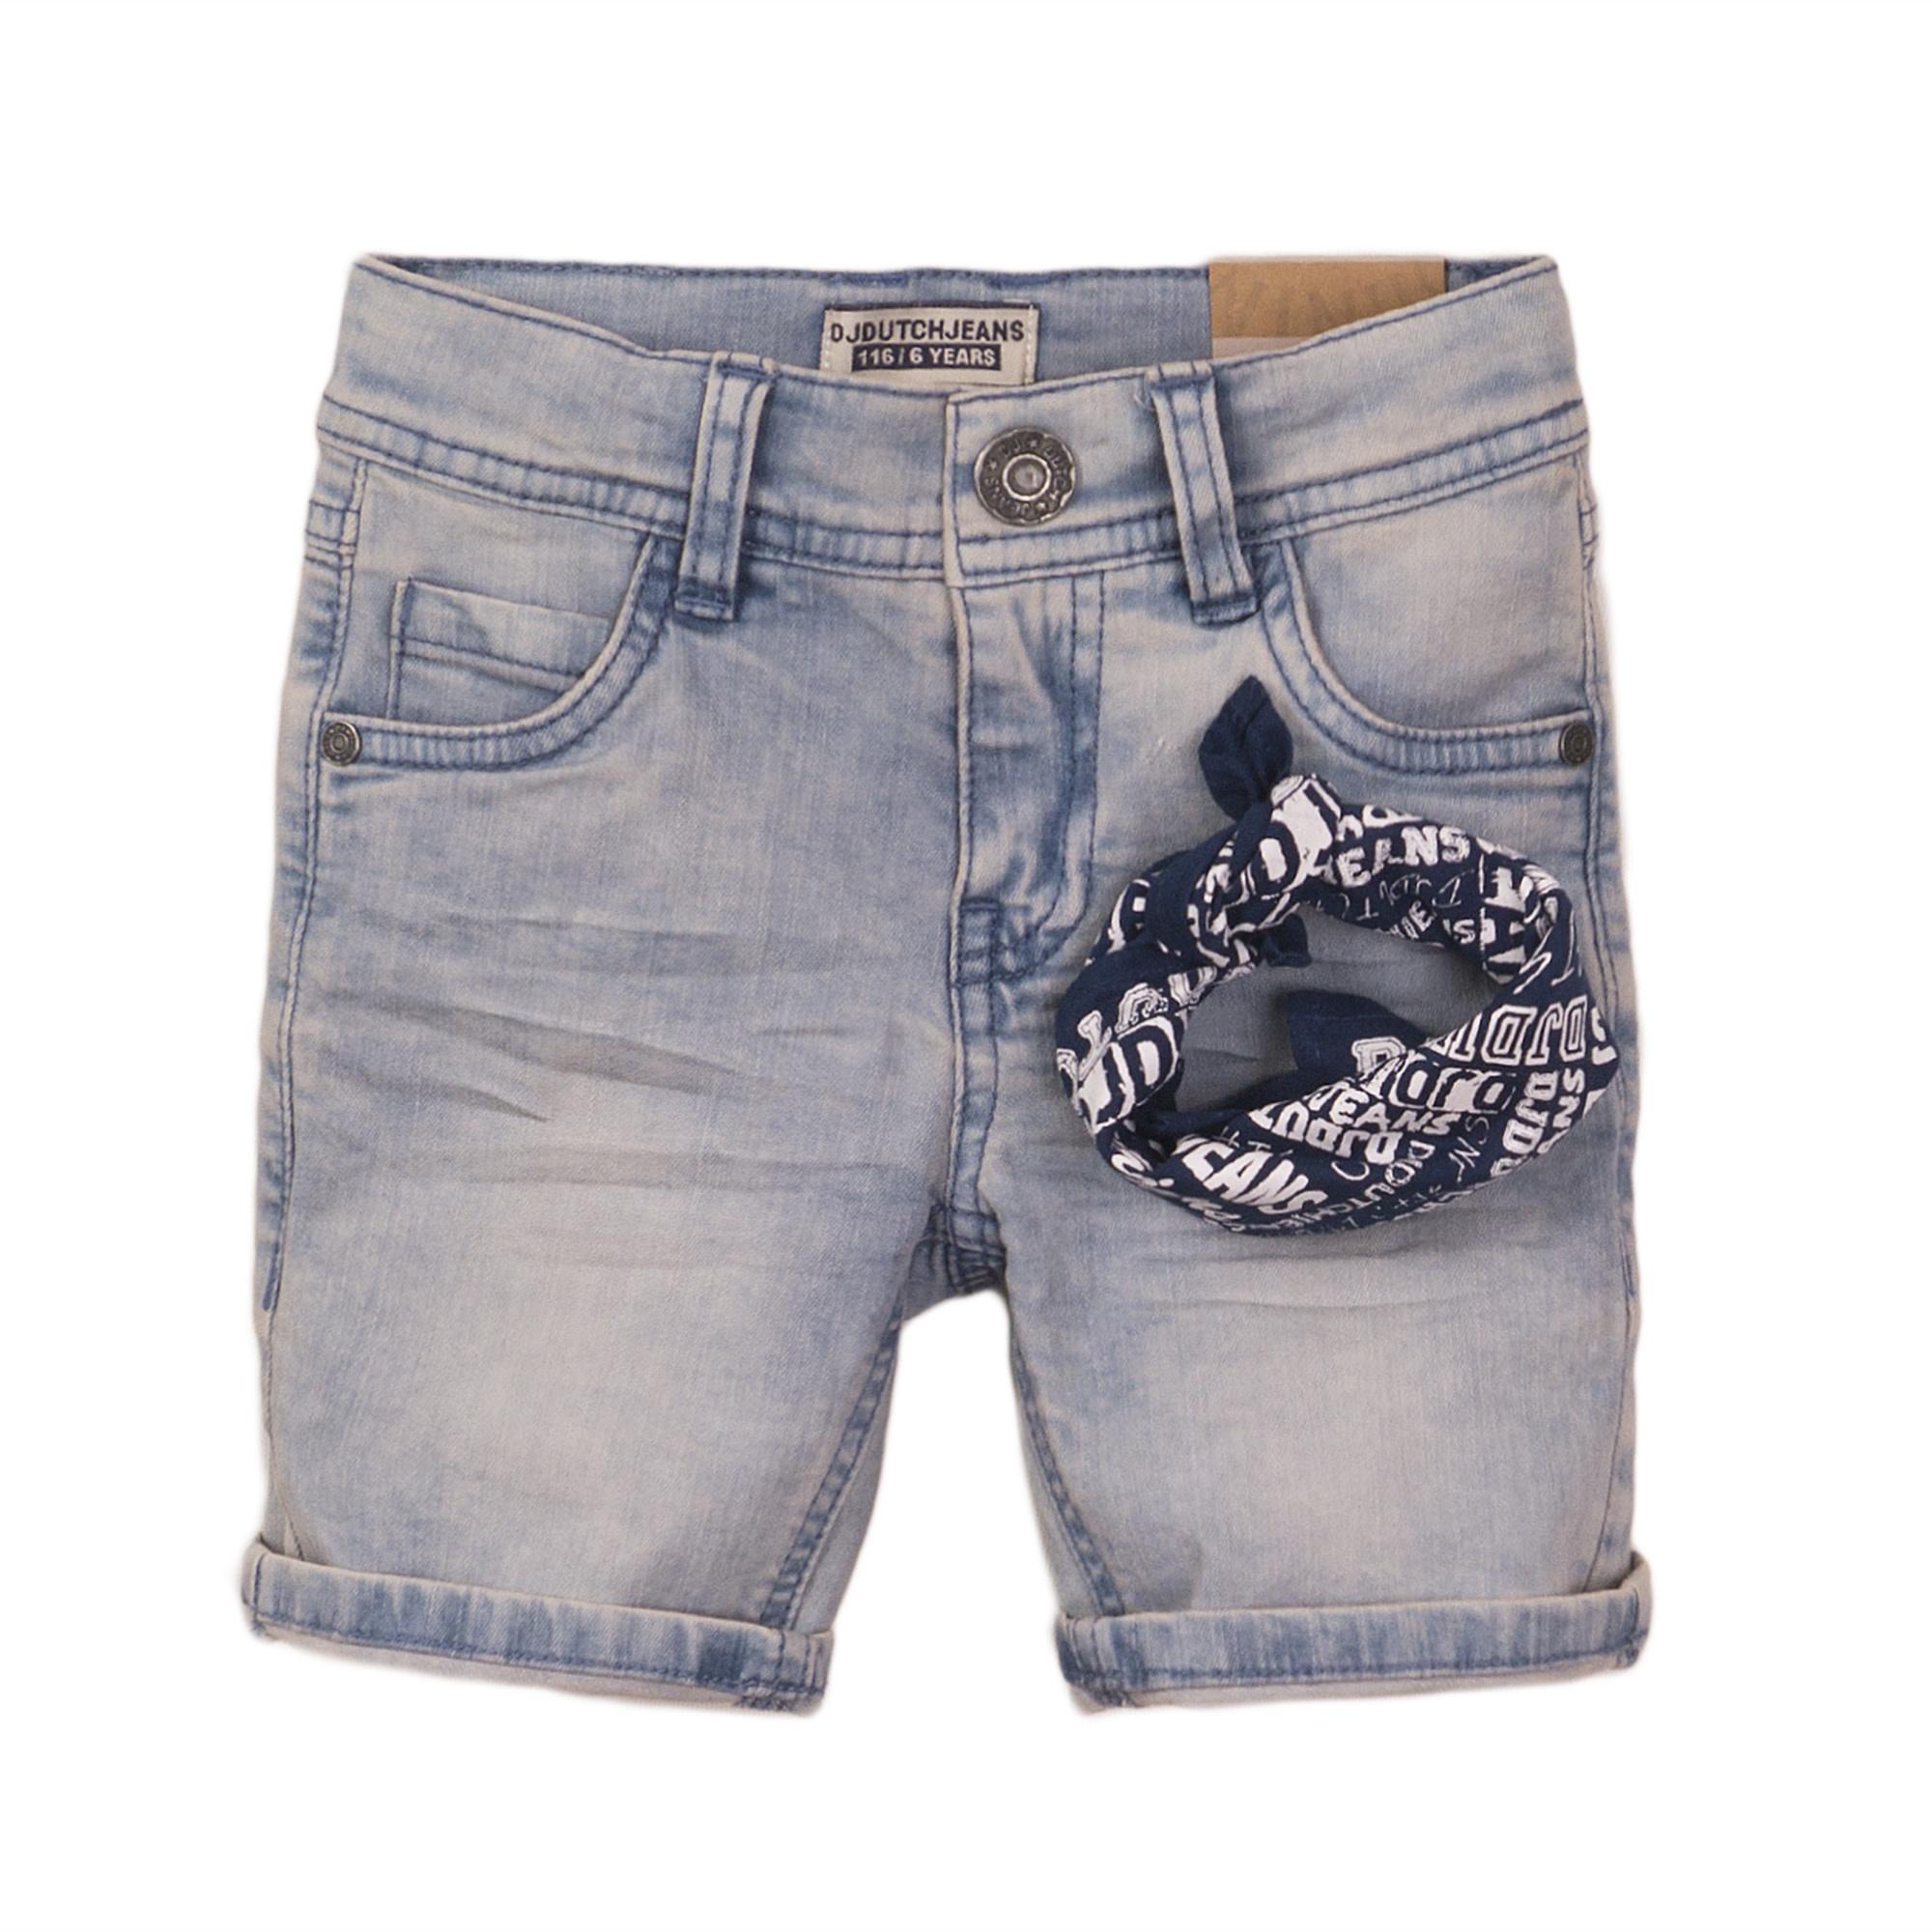 Medium Wash Shorts & Bandana Set